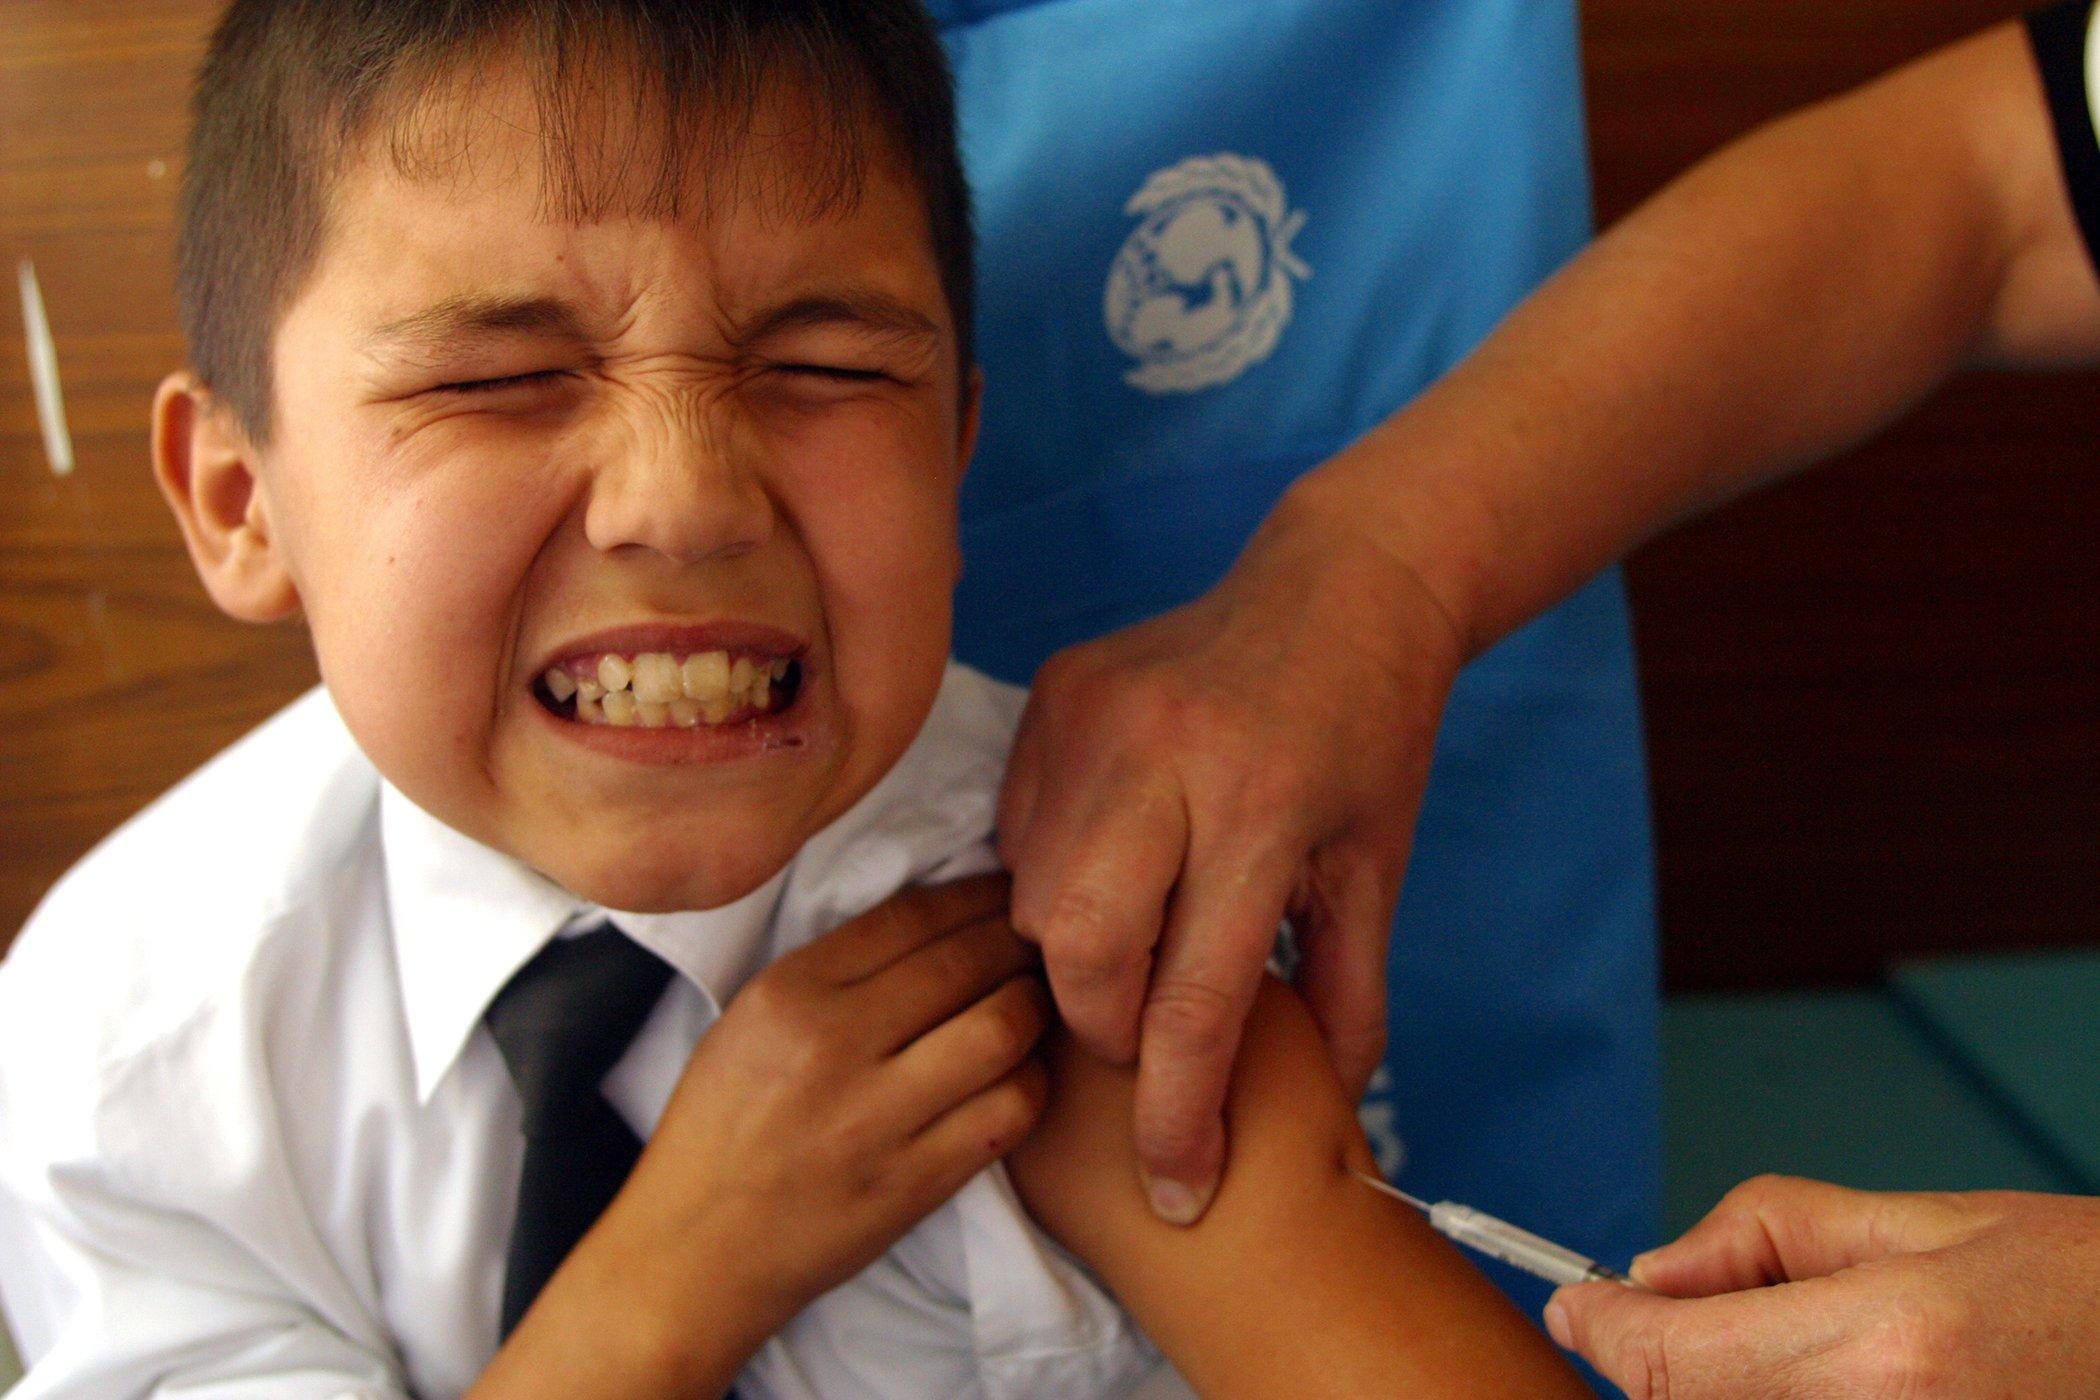 UNICEF_Vaccinations-Around-The-World_005.JPG